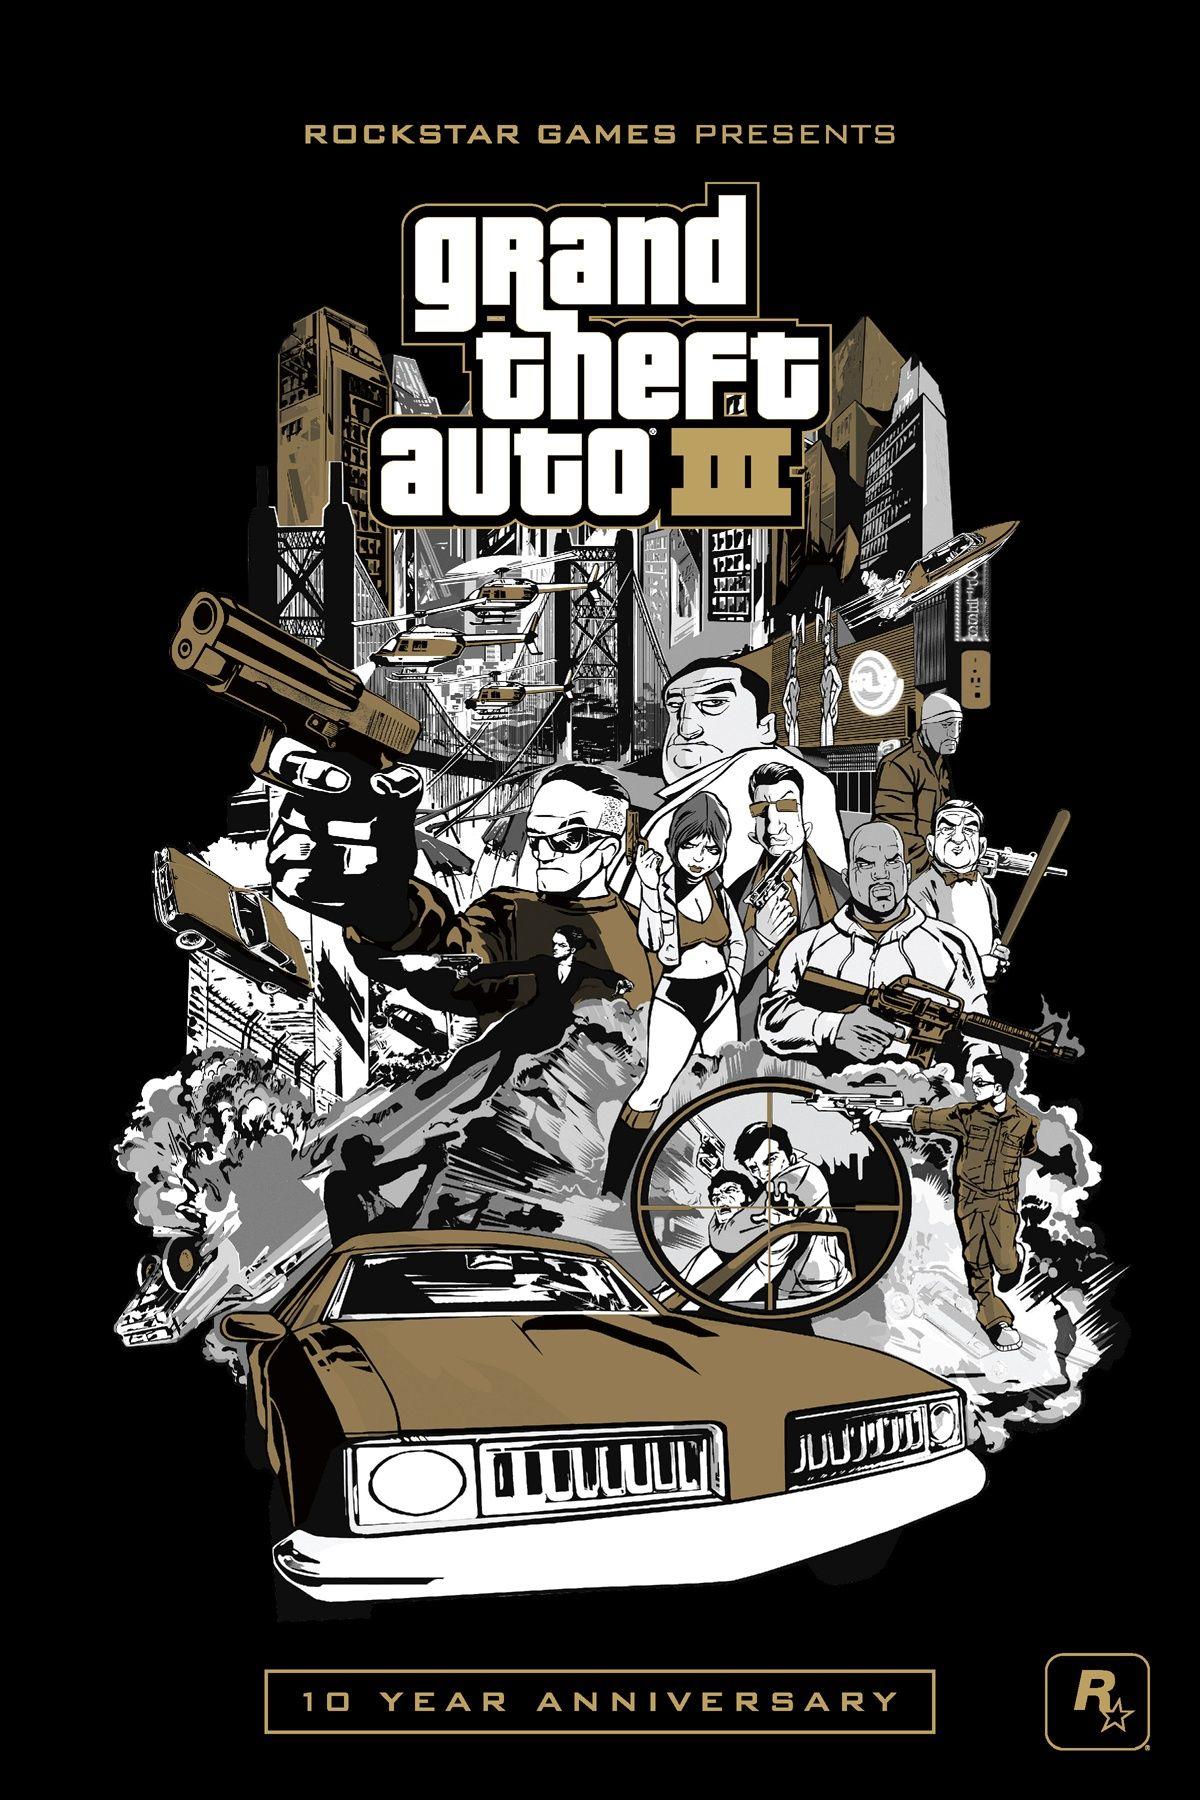 Grand Theft Auto Iii Grand Theft Auto Artwork Grand Theft Auto